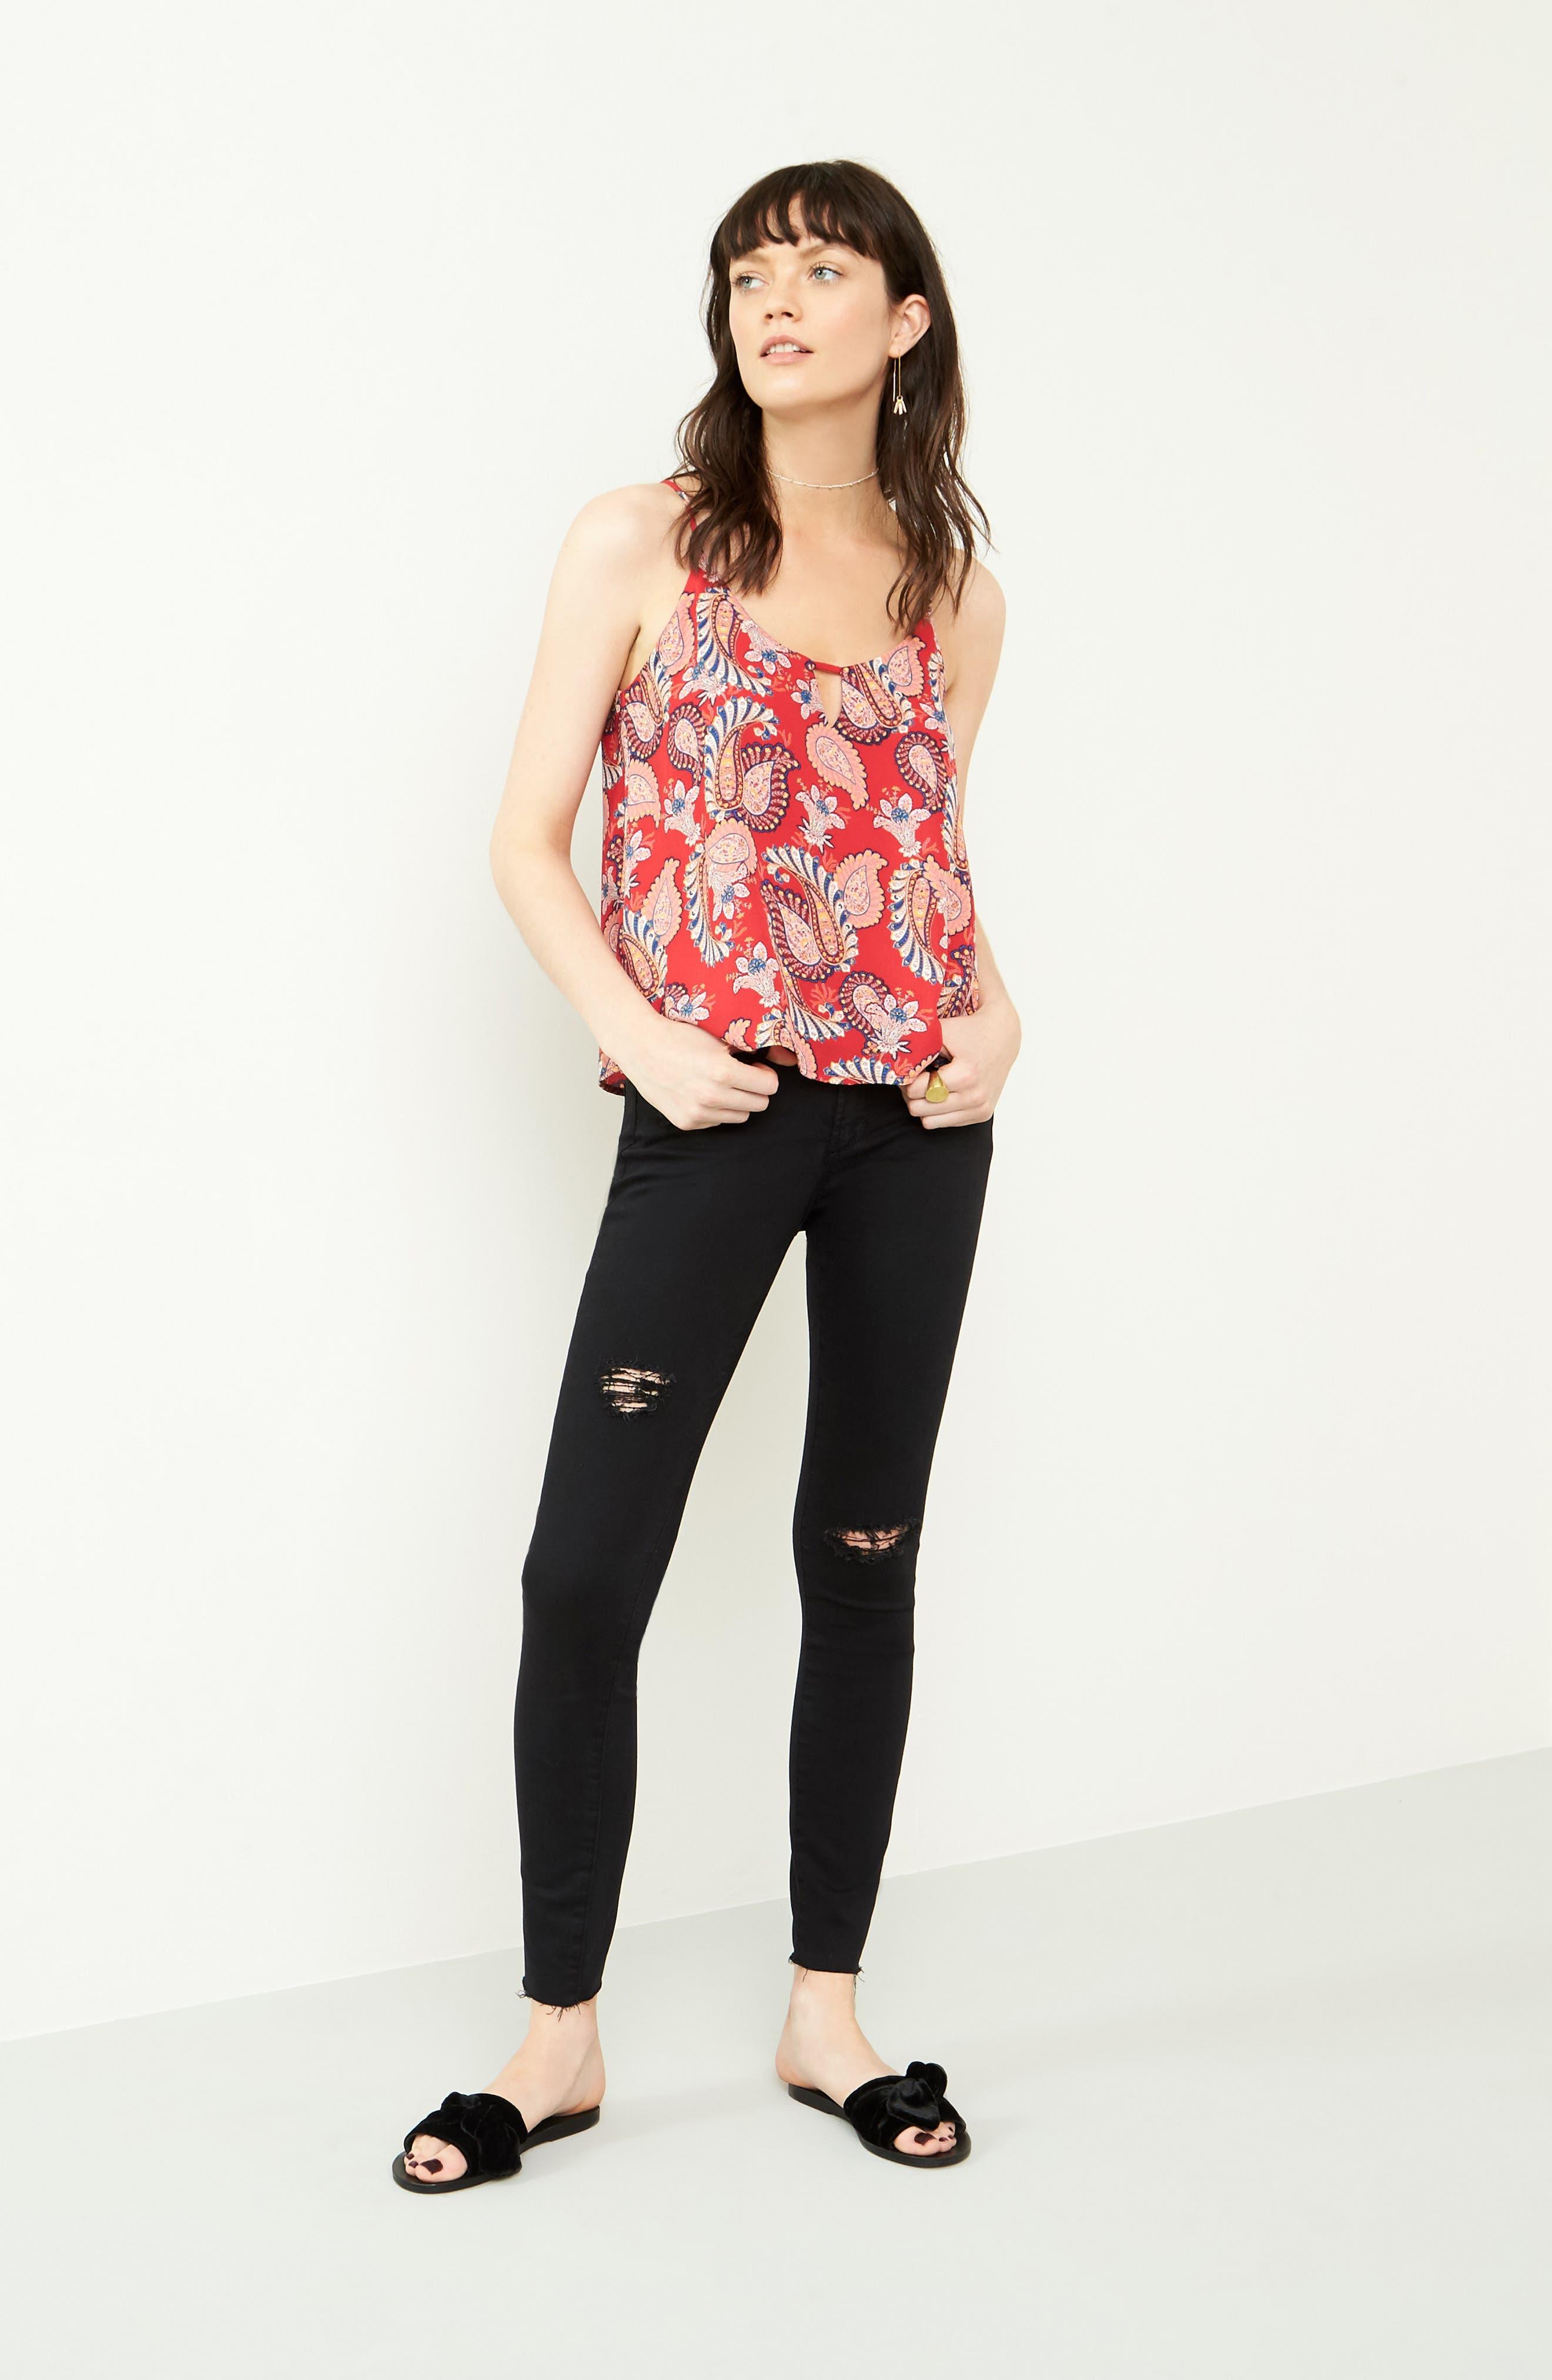 Sarah Skinny Jeans,                             Alternate thumbnail 8, color,                             001